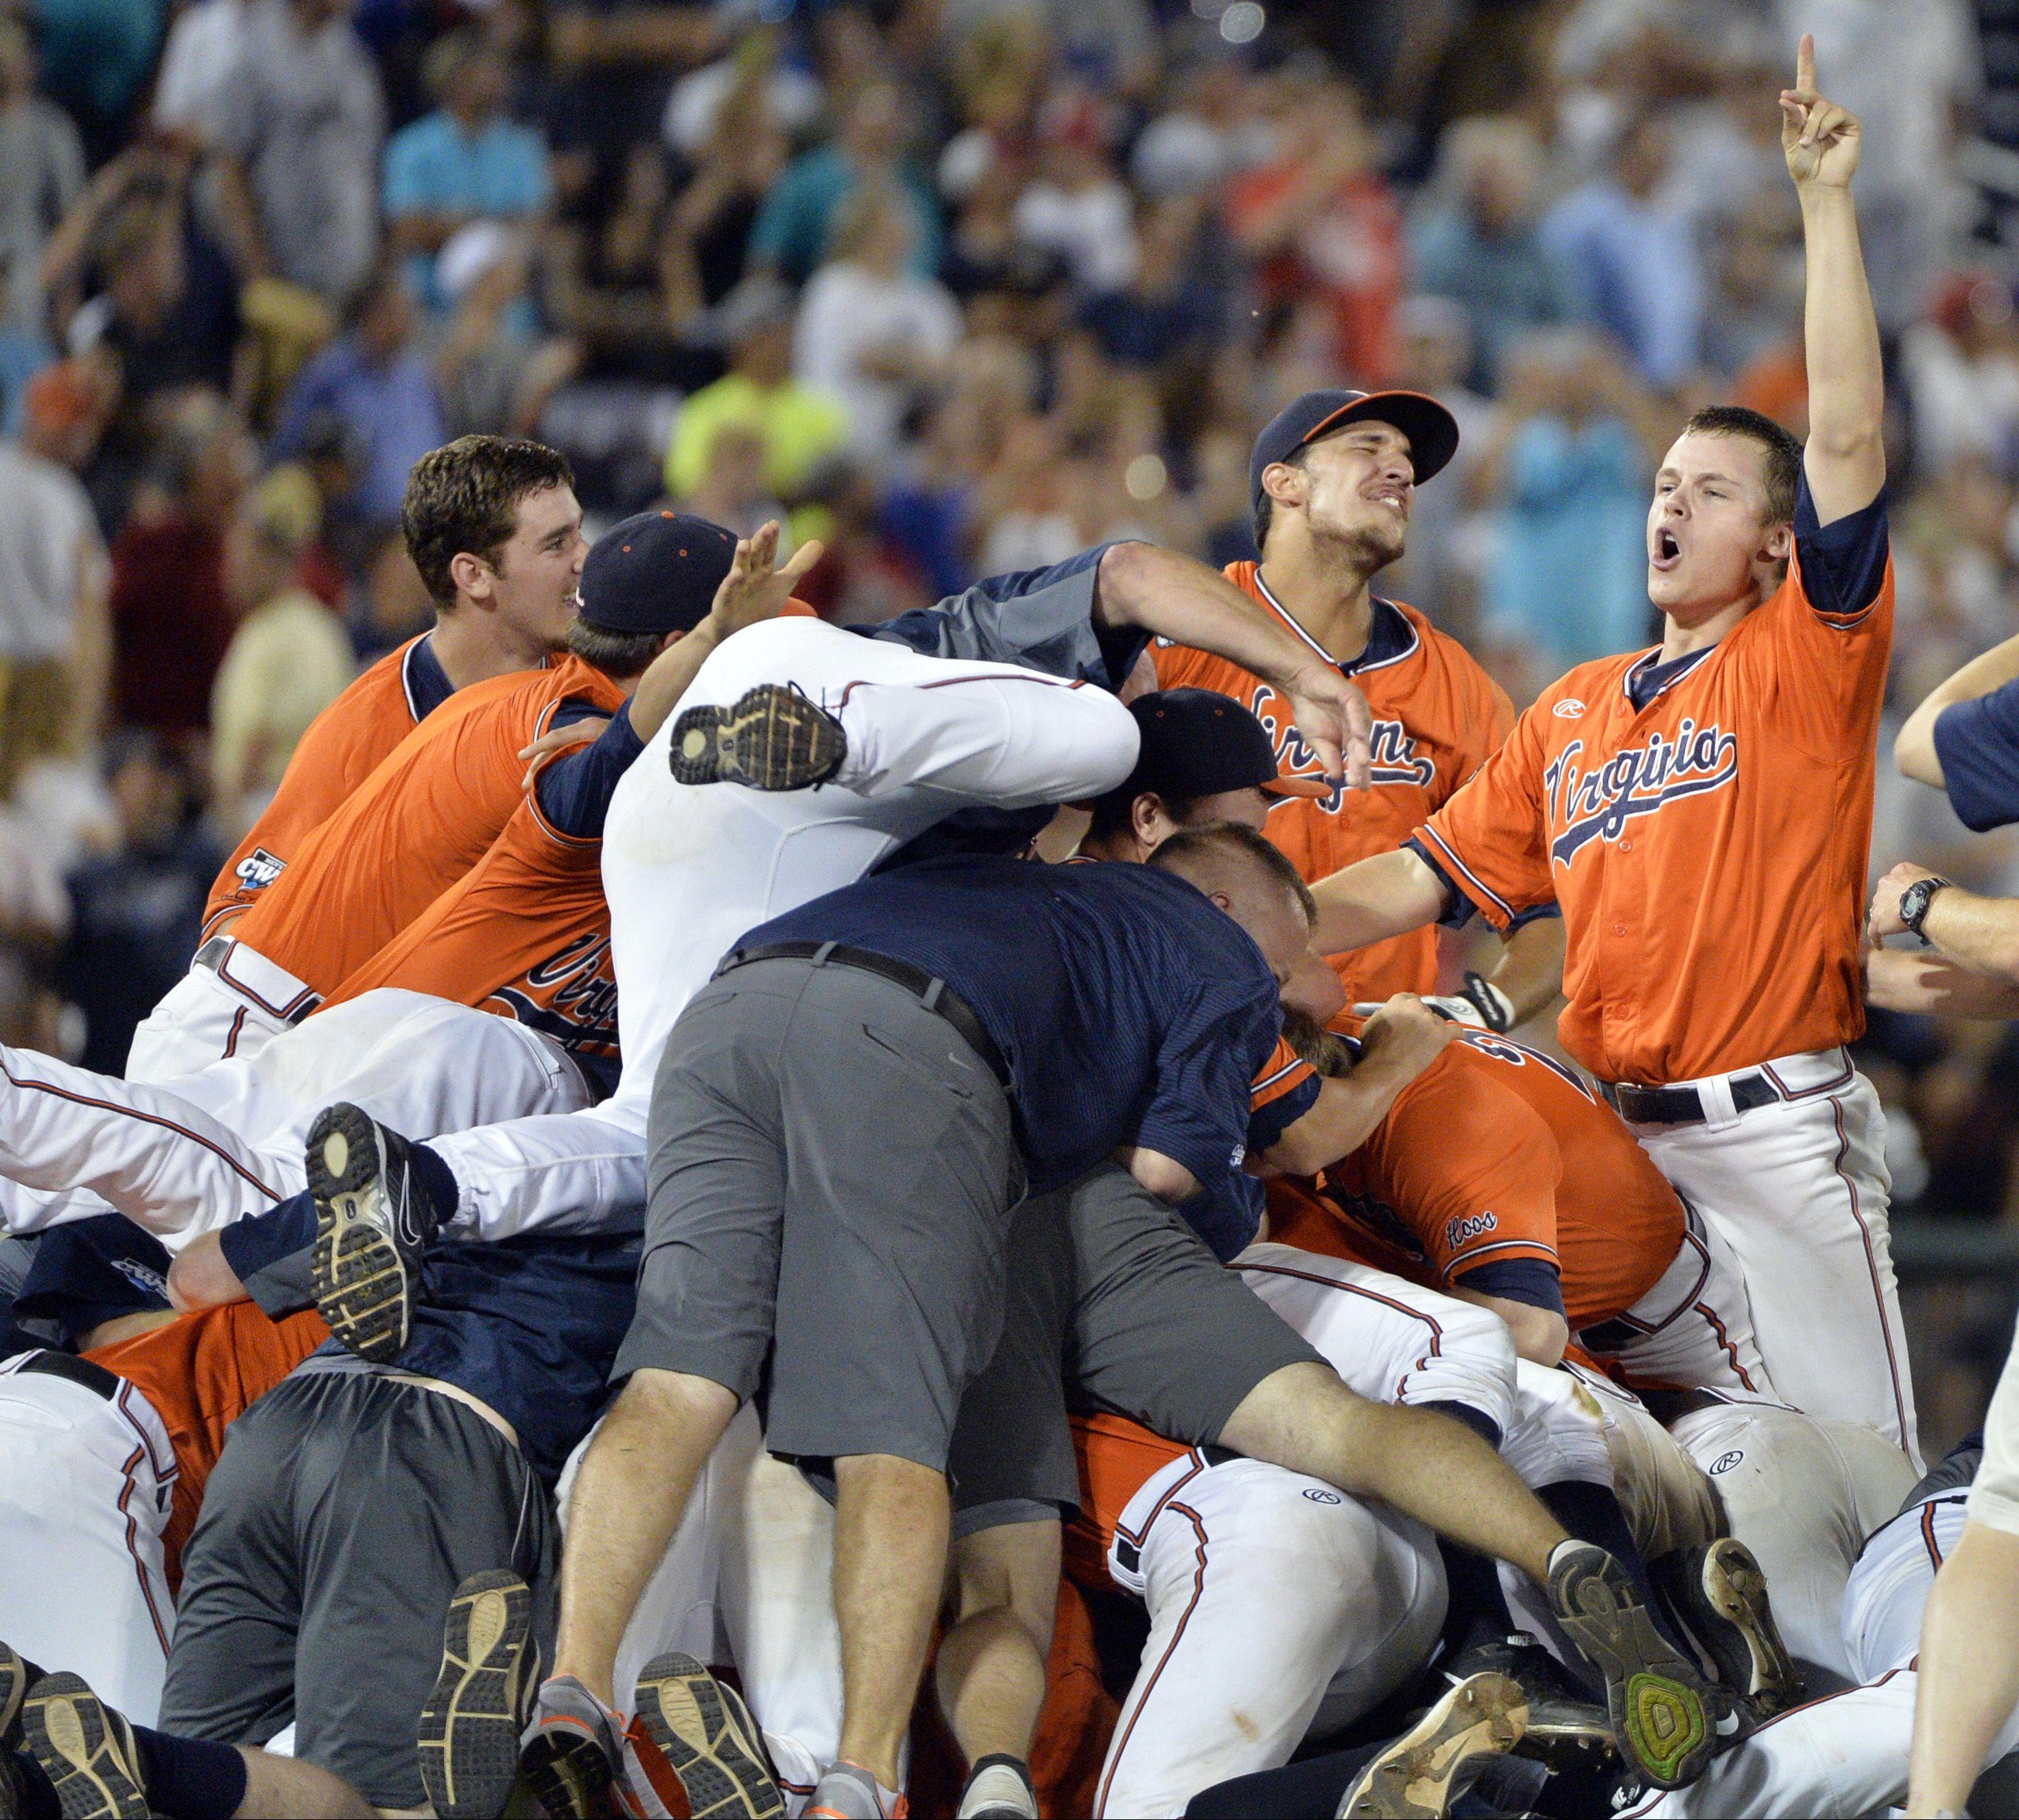 Virginia Wins First Ncaa Baseball Championship With Victory Over Vanderbilt Vanderbilt Baseball Vanderbil College Baseball College World Series Baseball Live